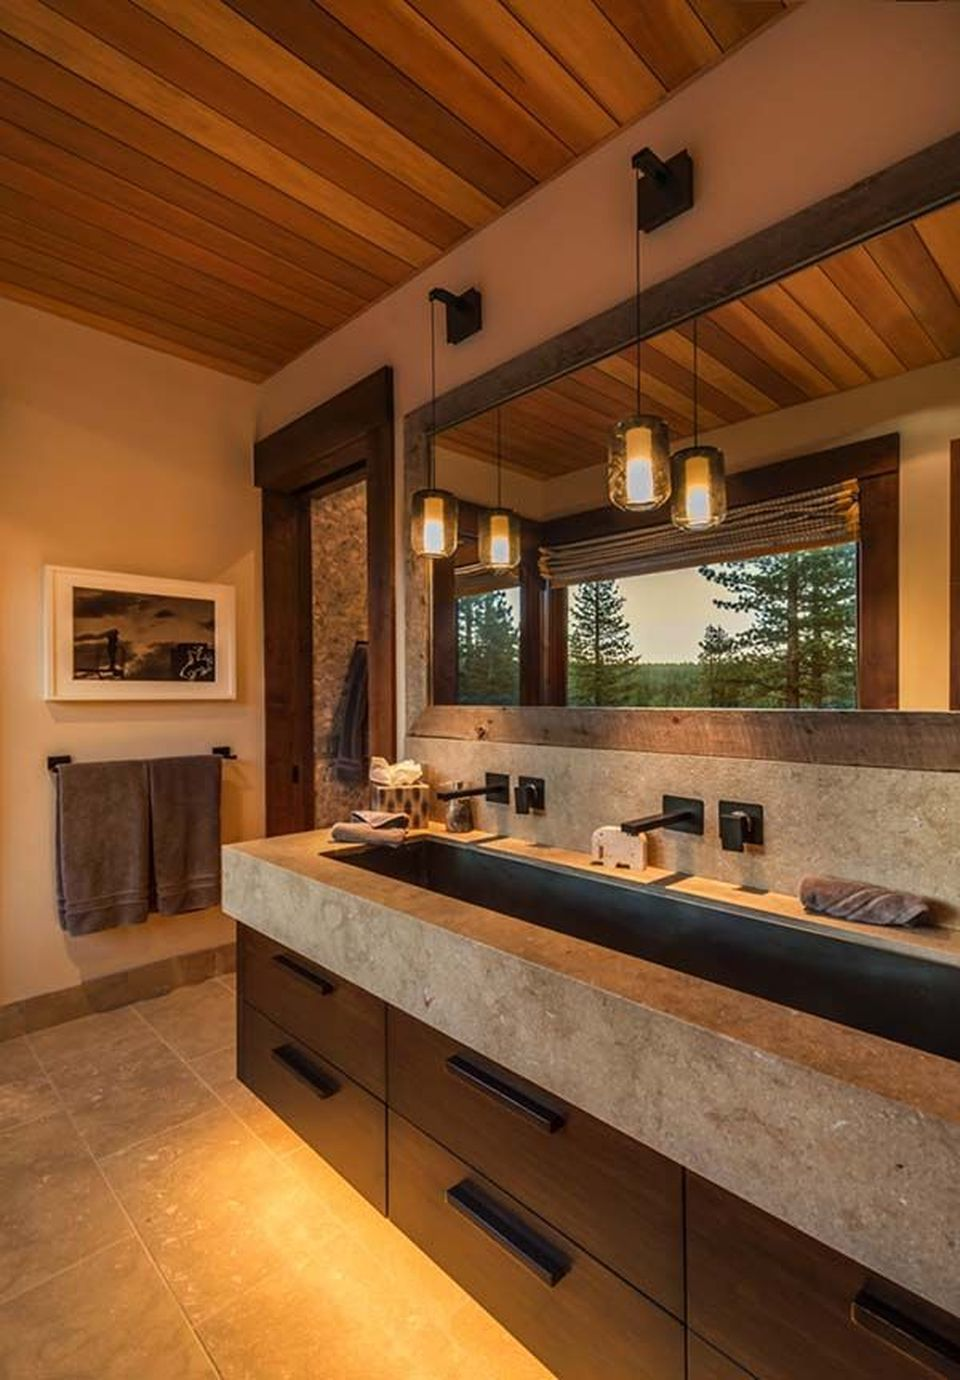 Inspiring Warm Modern Interior Decorations Style 6 Modern